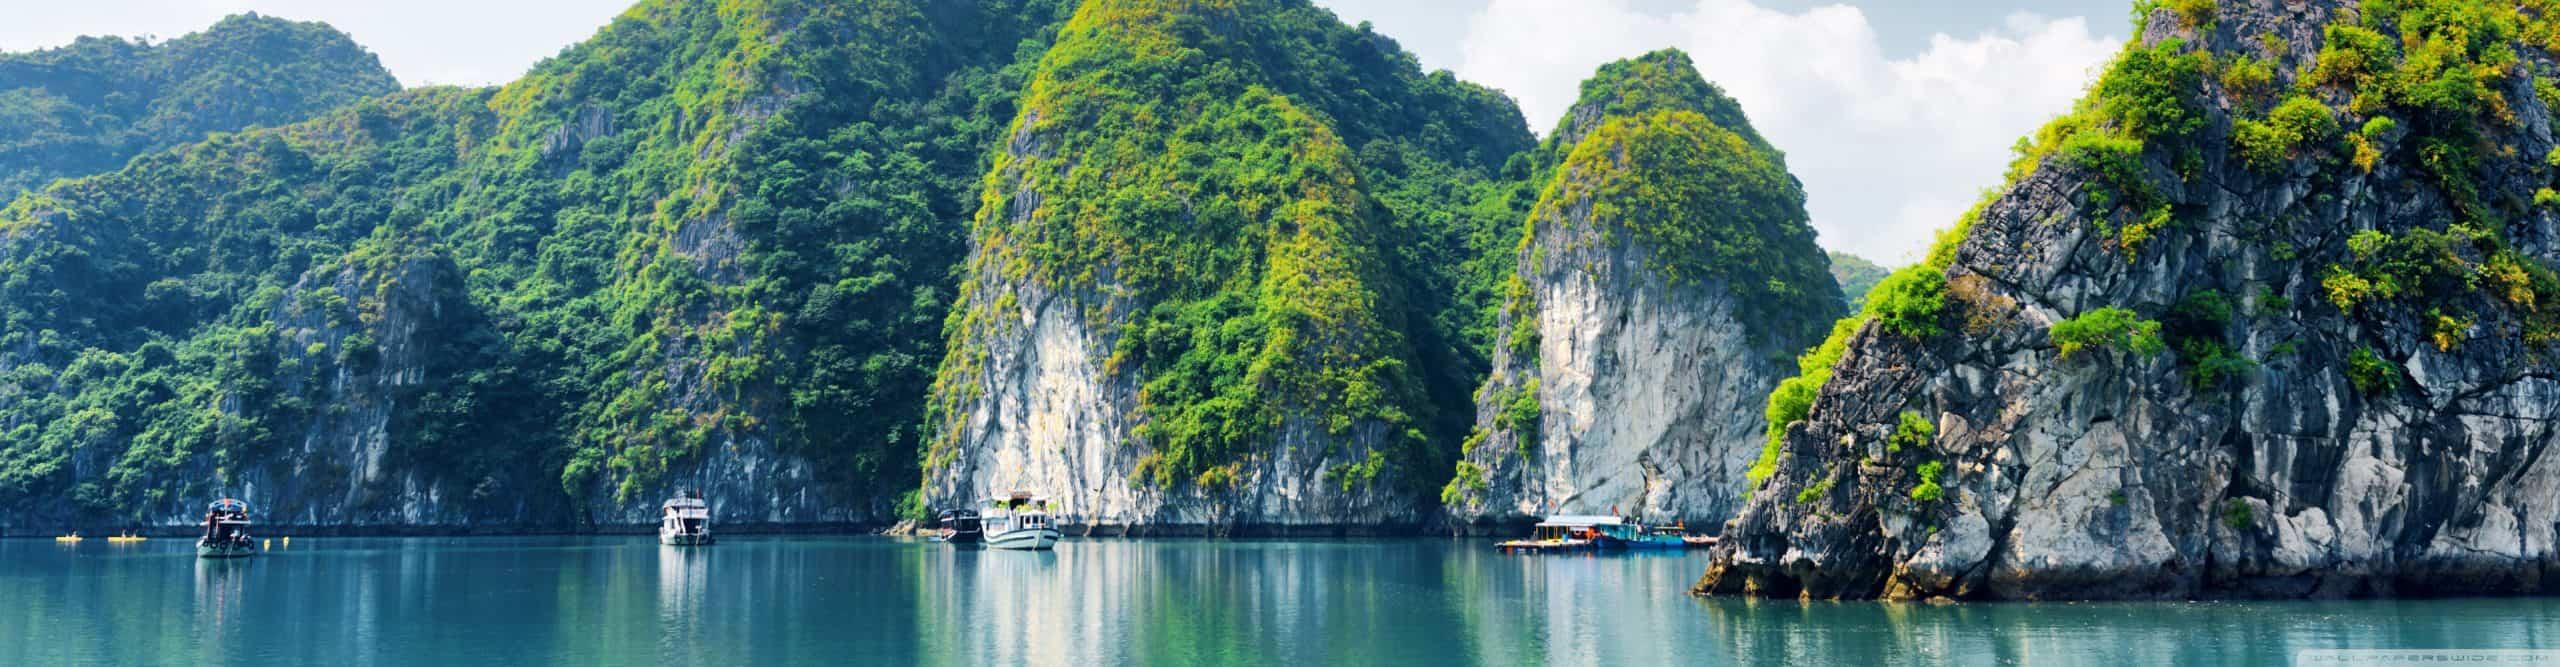 Discover Vietnam your way!